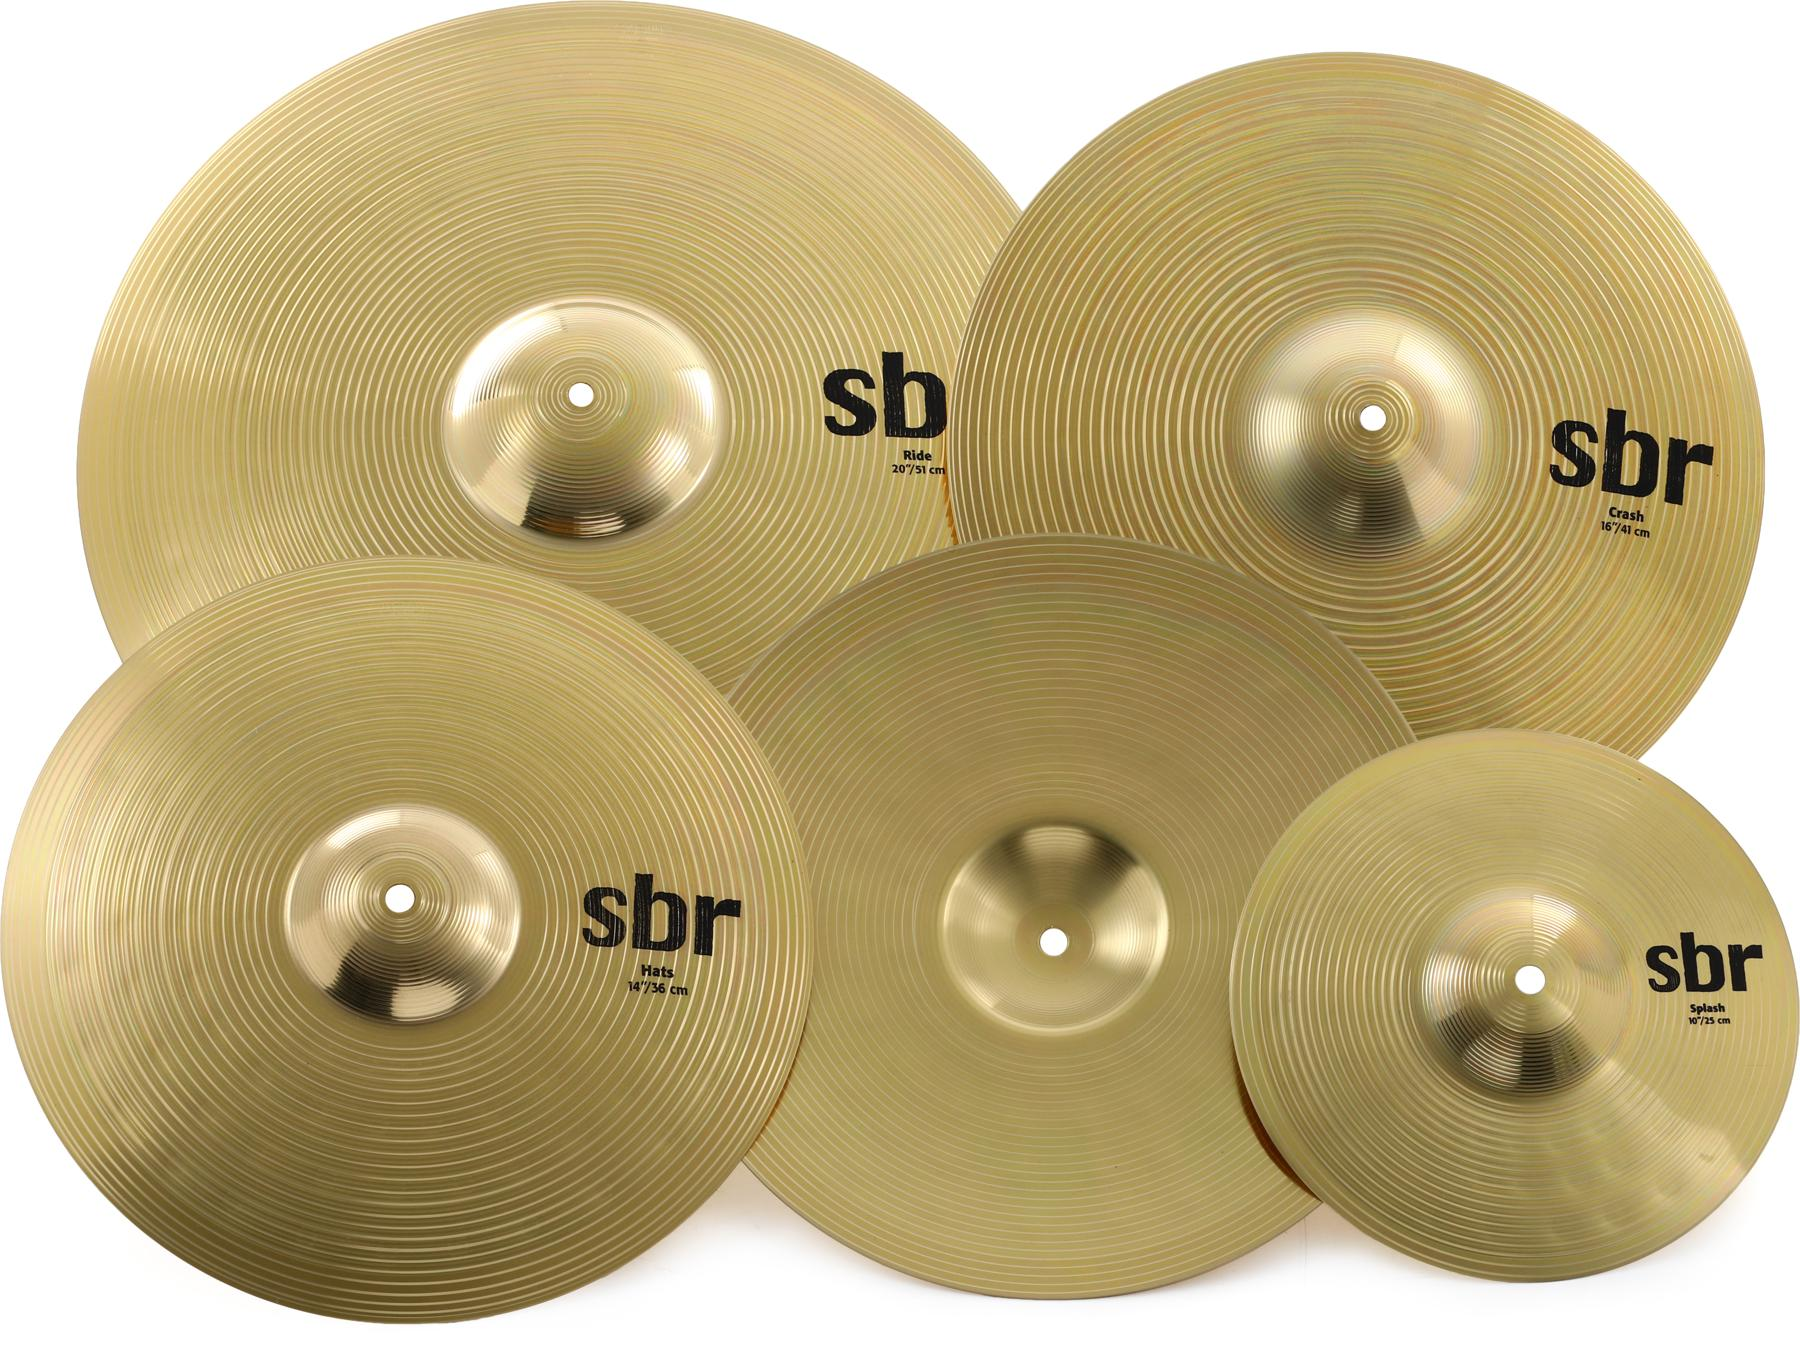 2. Sabian SBR Promotional Cymbal Set